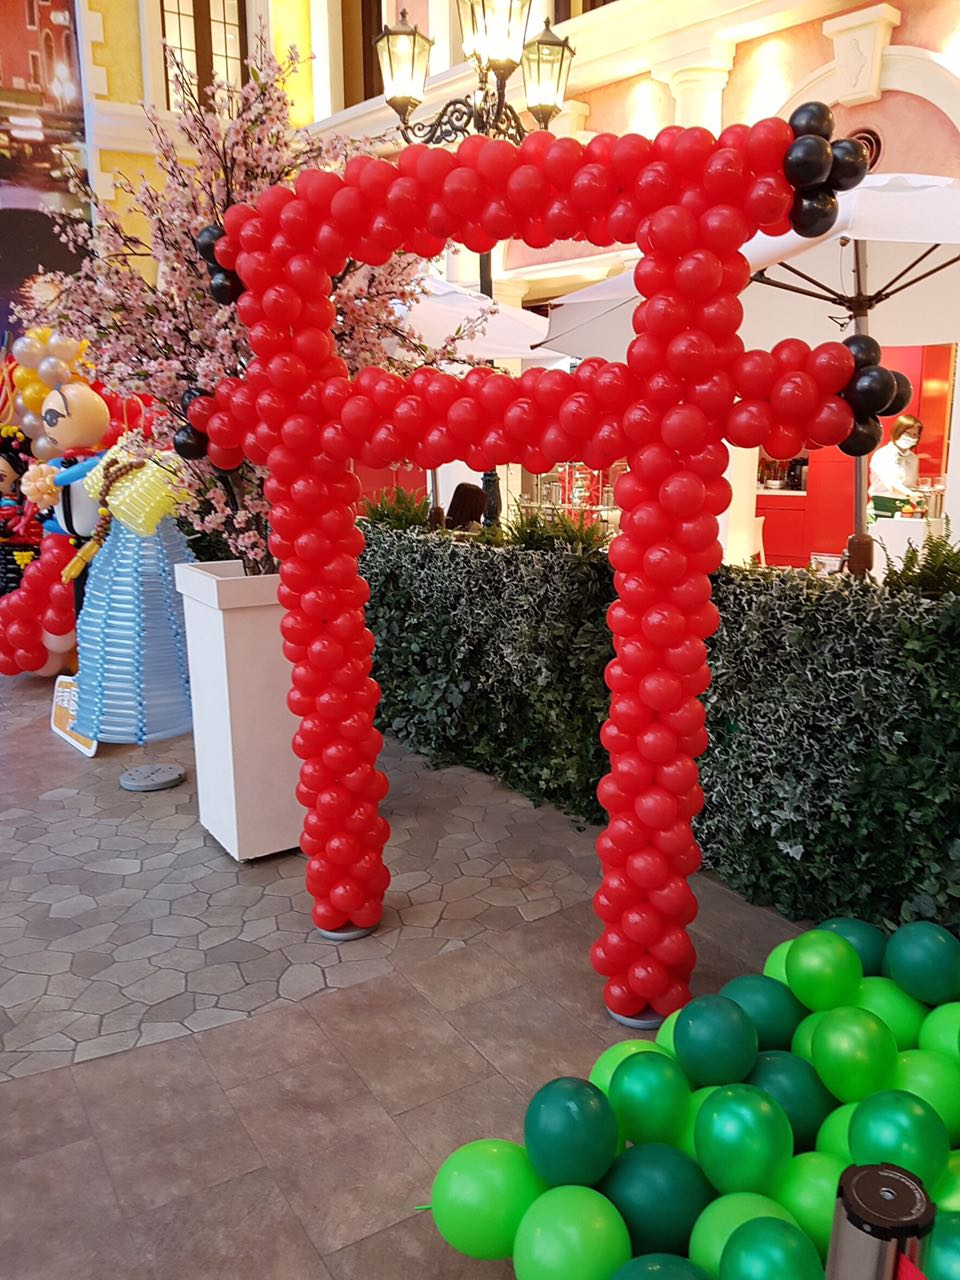 Around the World Theme Balloon Exhibit Japanese Temple Gate